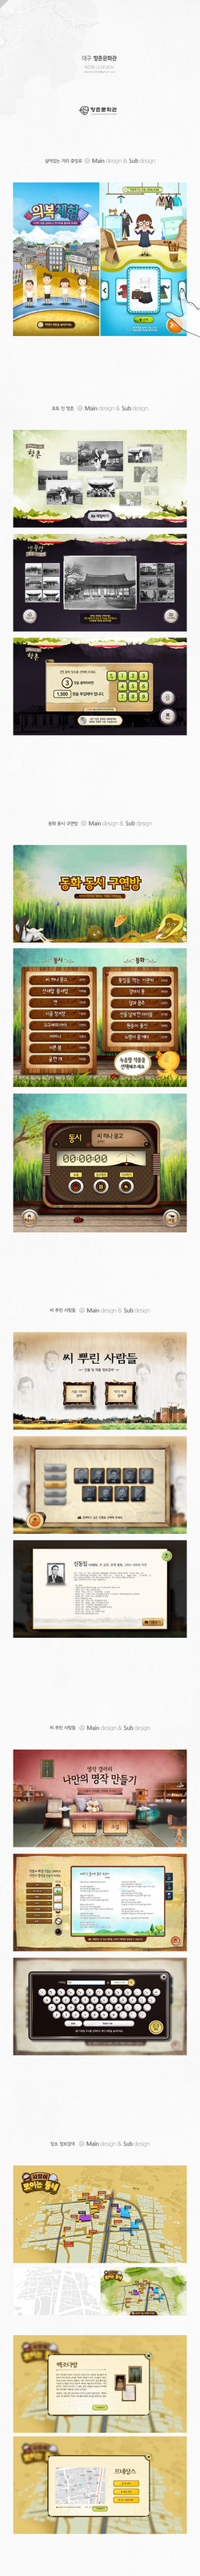 대구 향촌문화관